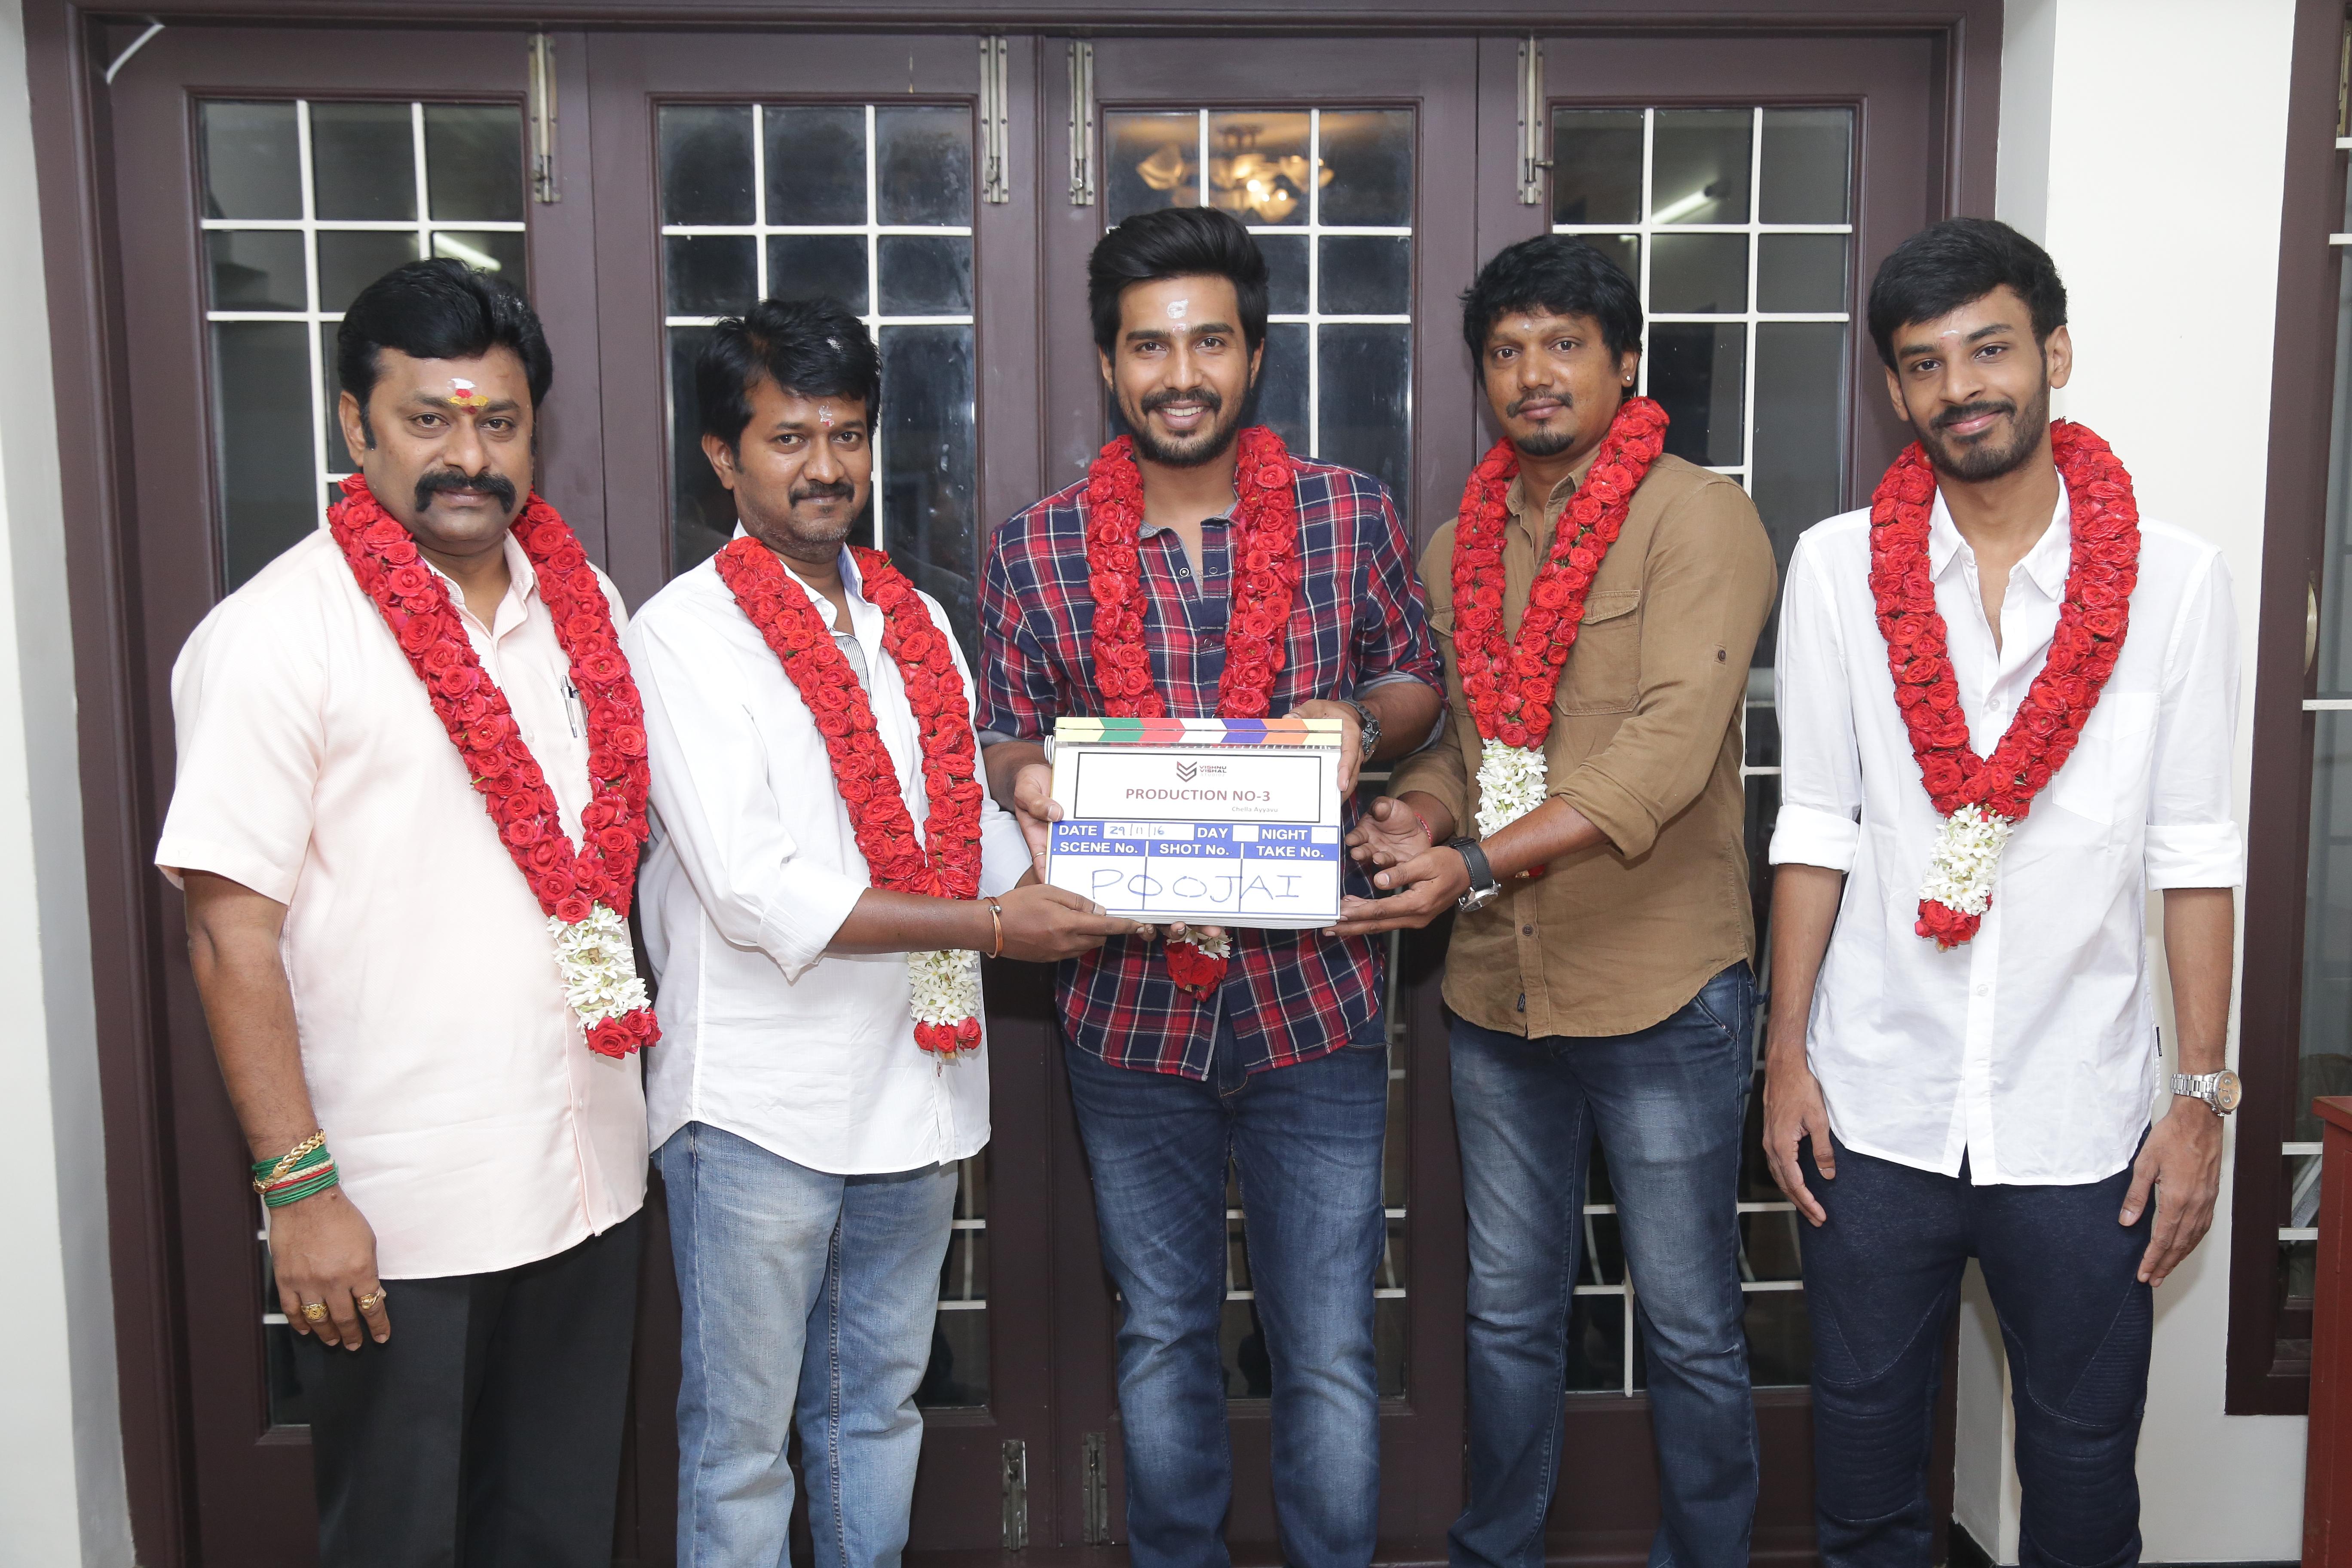 Vishnu Vishal Studioz Kick Started production No3